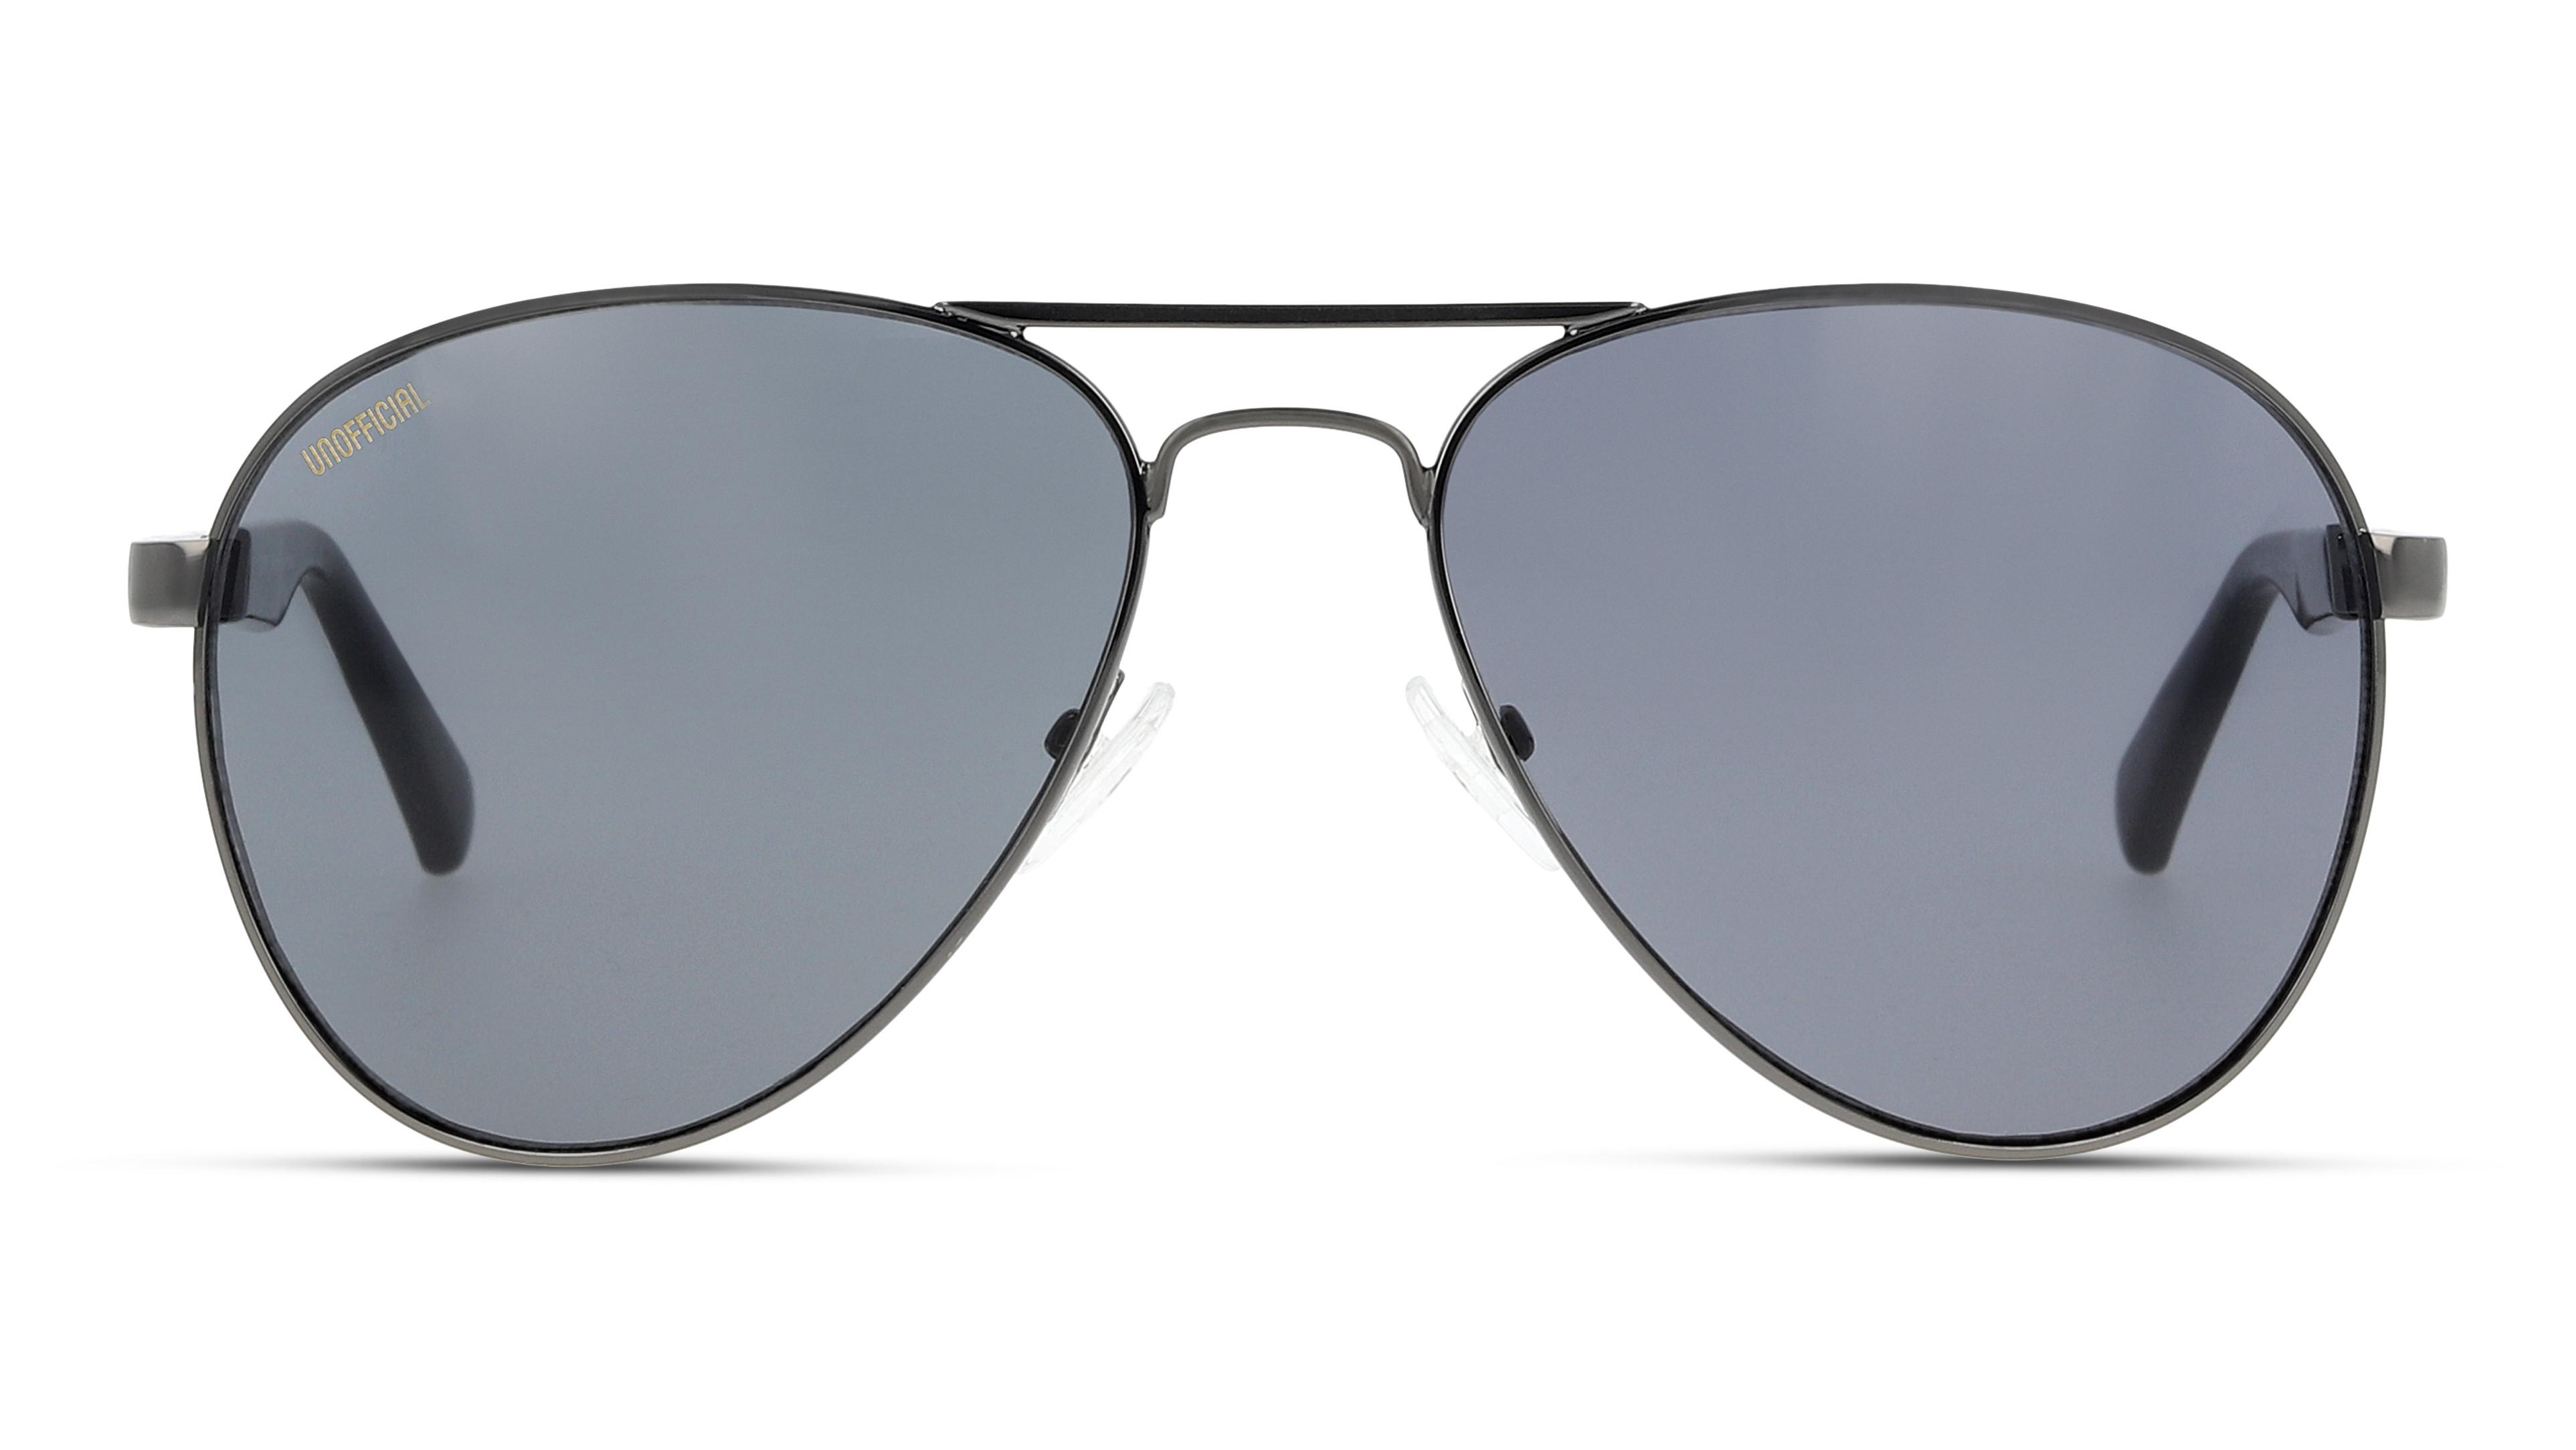 8719154742958-front-01-unofficial-unsu0036-eyewear-grey-grey